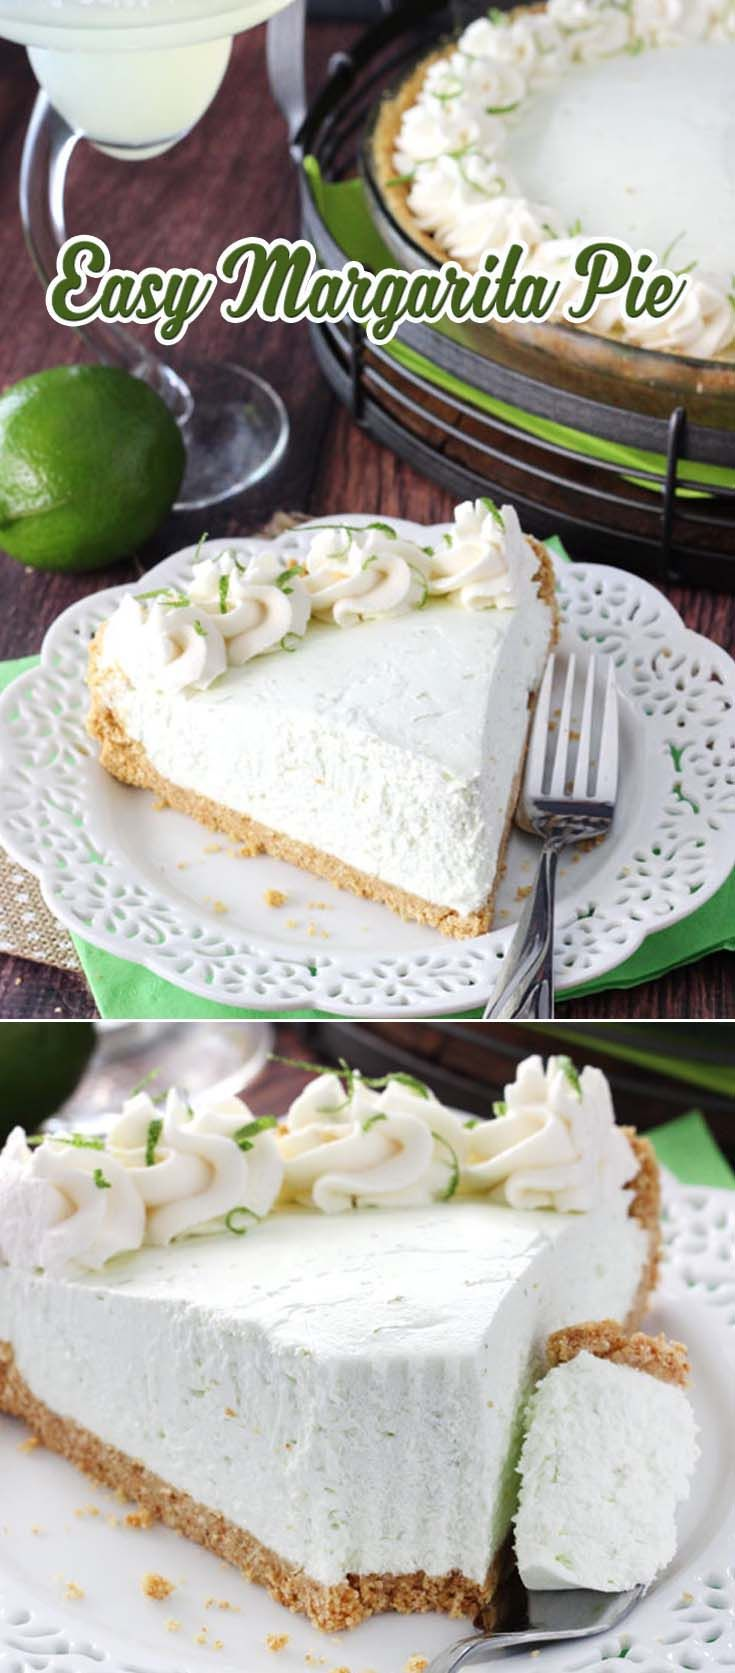 Easy Margarita Pie